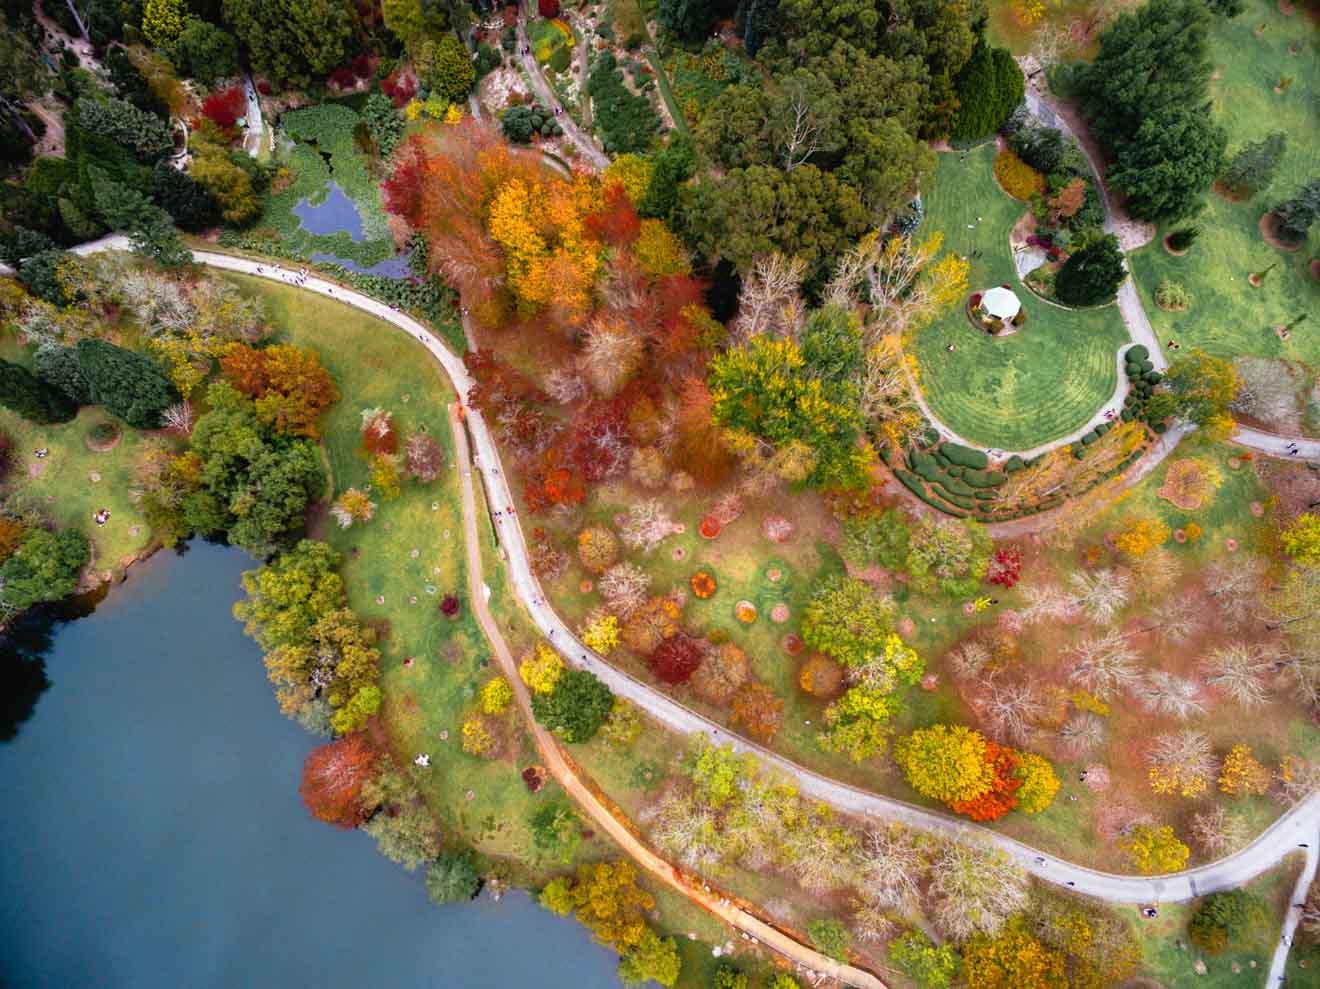 Romantic Getaways Adelaide - Botanic Garden Day trips from Adelaide